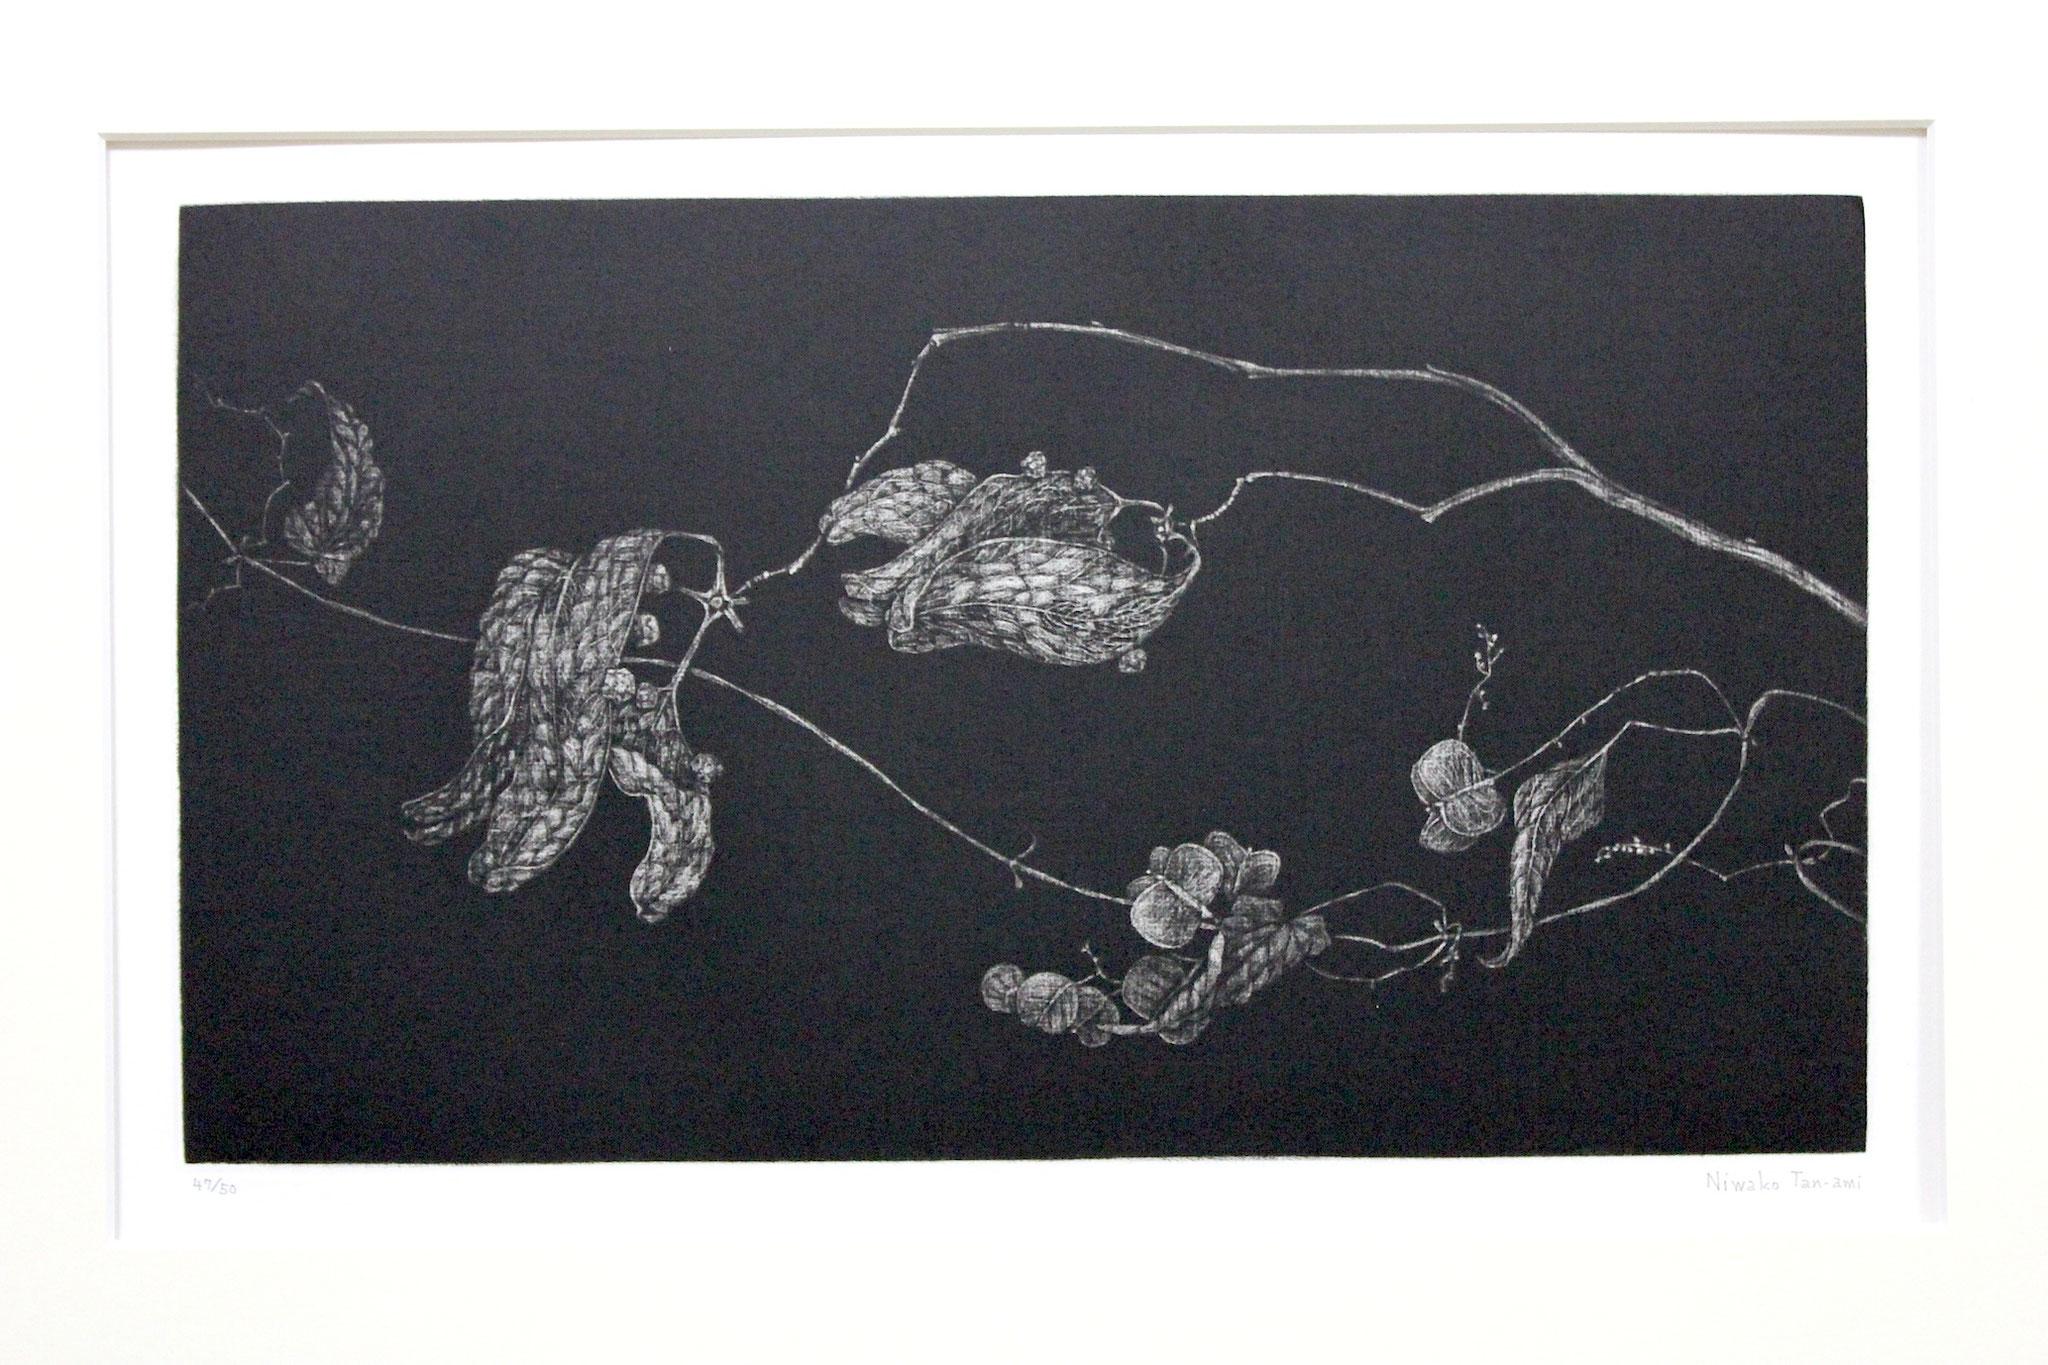 Niwako  Tanami  /  丹阿弥丹波子 梧桐の実  メゾチント、紙 1983年